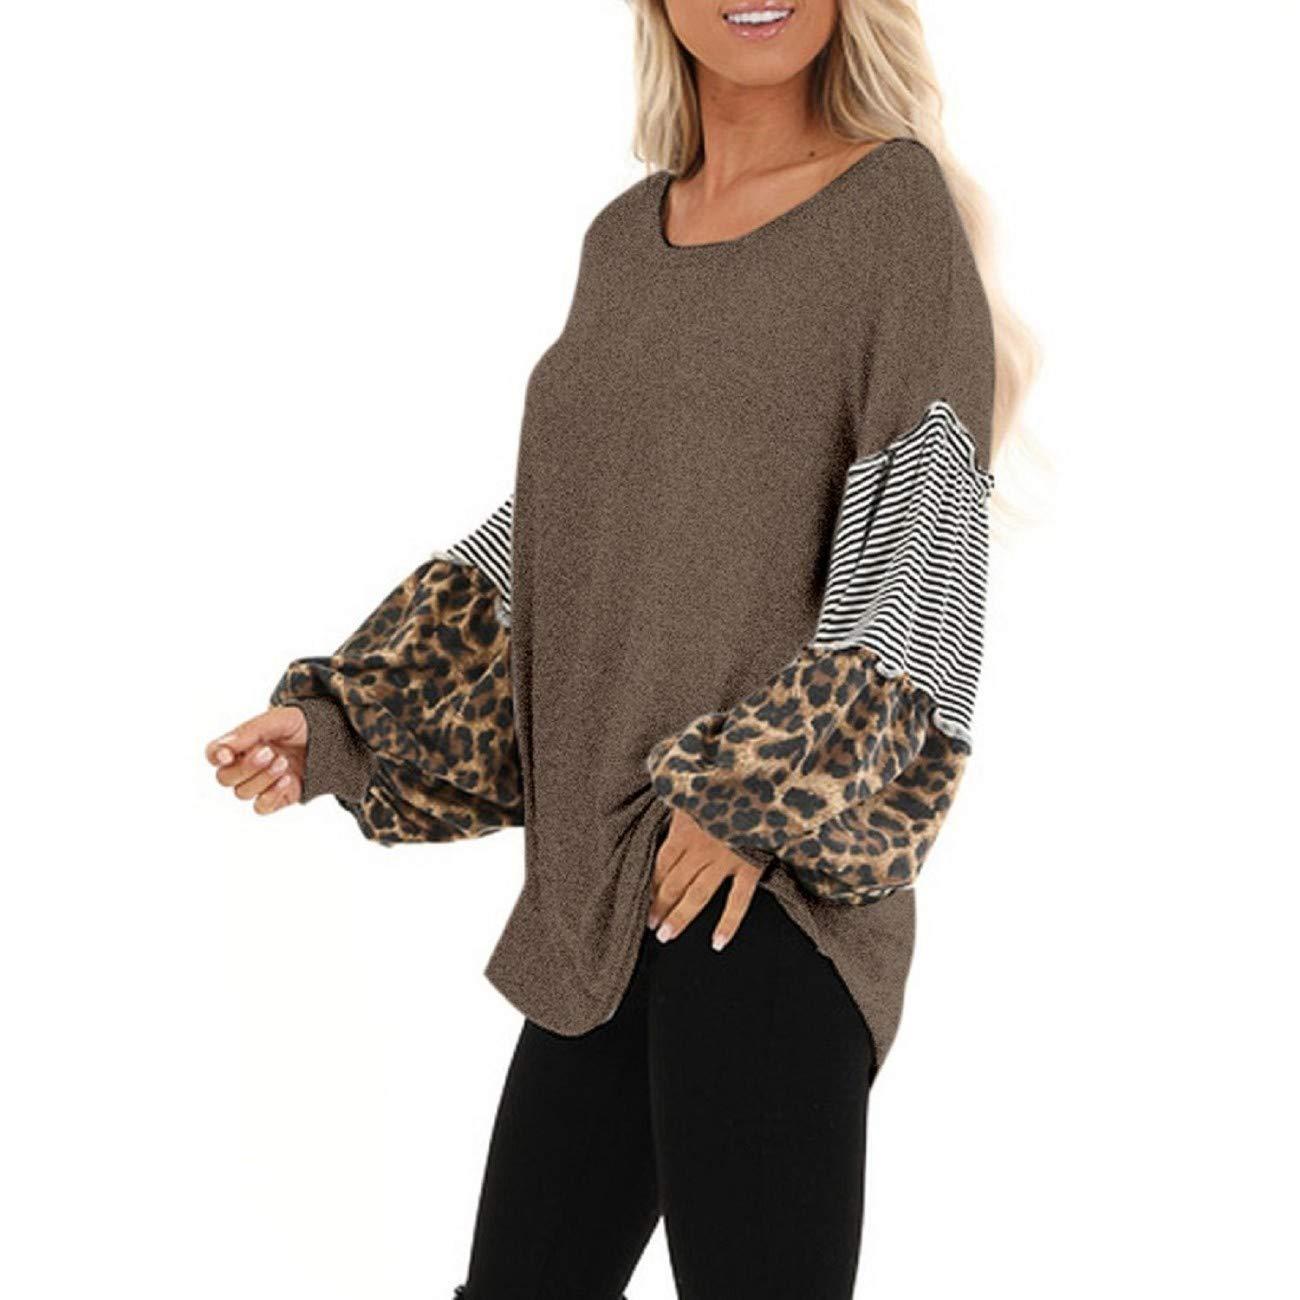 Tsmile Women Leopard Print Sweatshirt Long Lantern Sleeve Color Block Patchwork Striped Casual Tunic Tops Pullovers